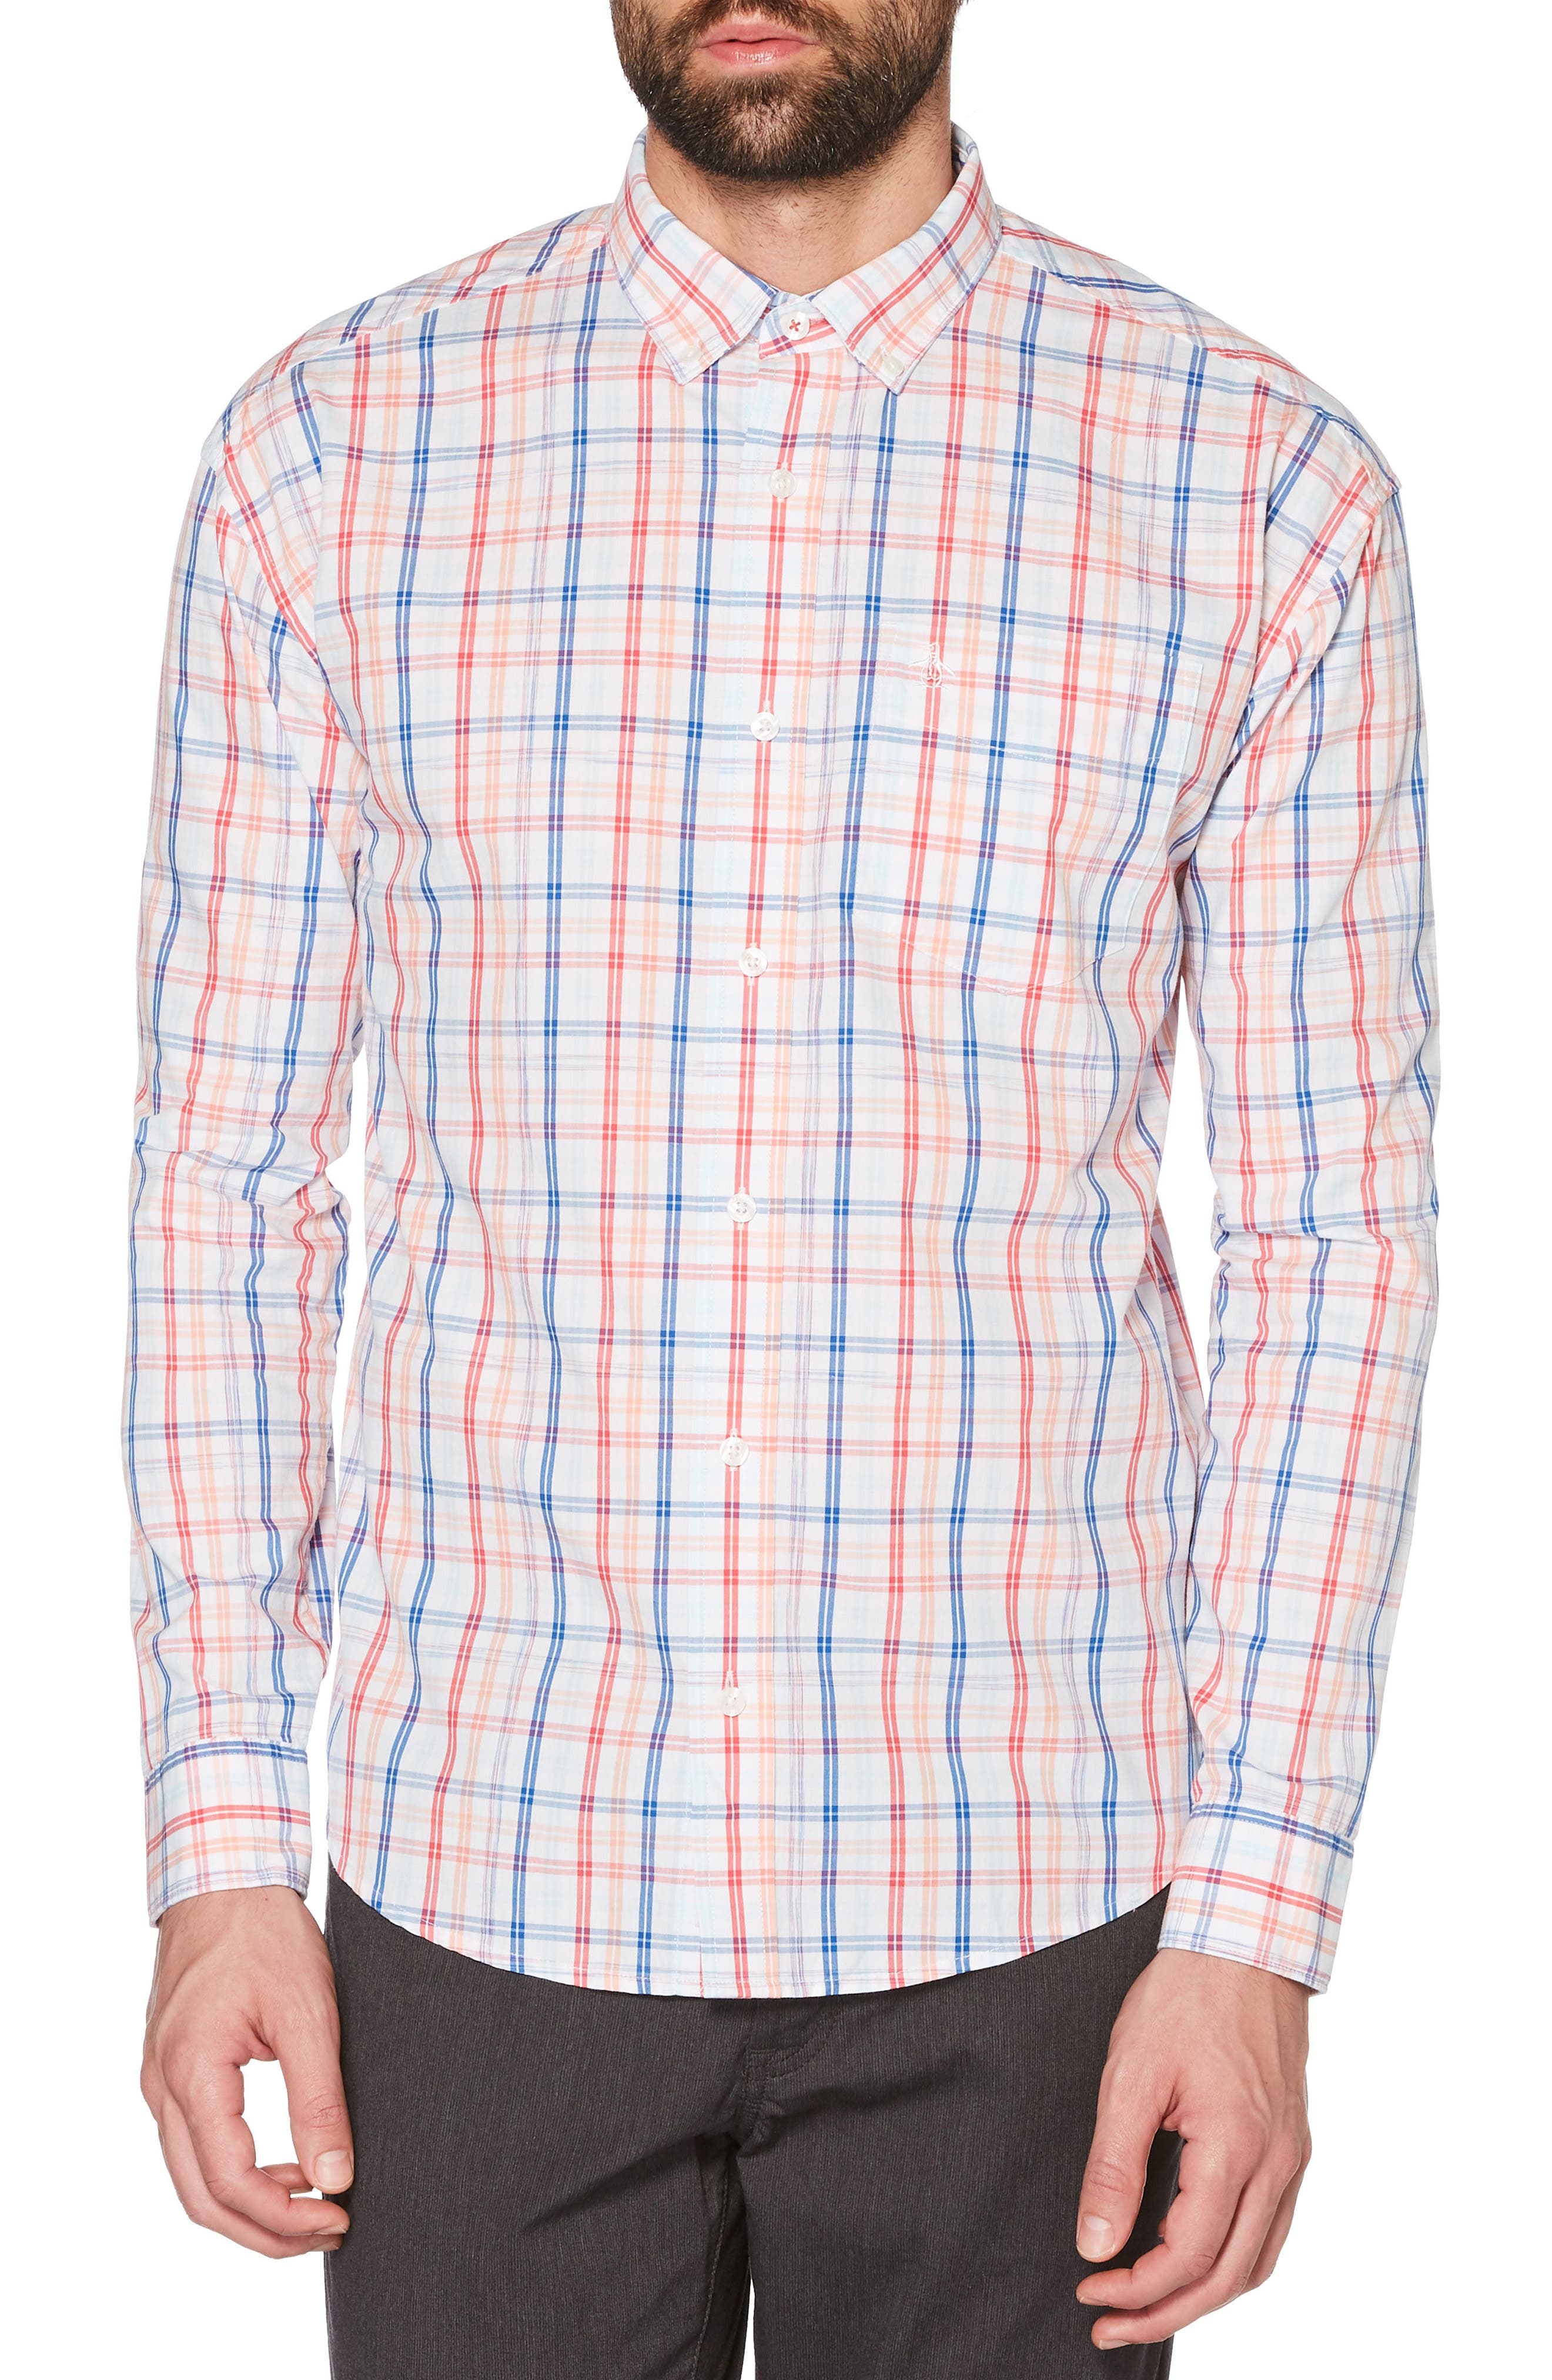 P55 Space Dye Plaid Shirt,                             Main thumbnail 1, color,                             Bright White